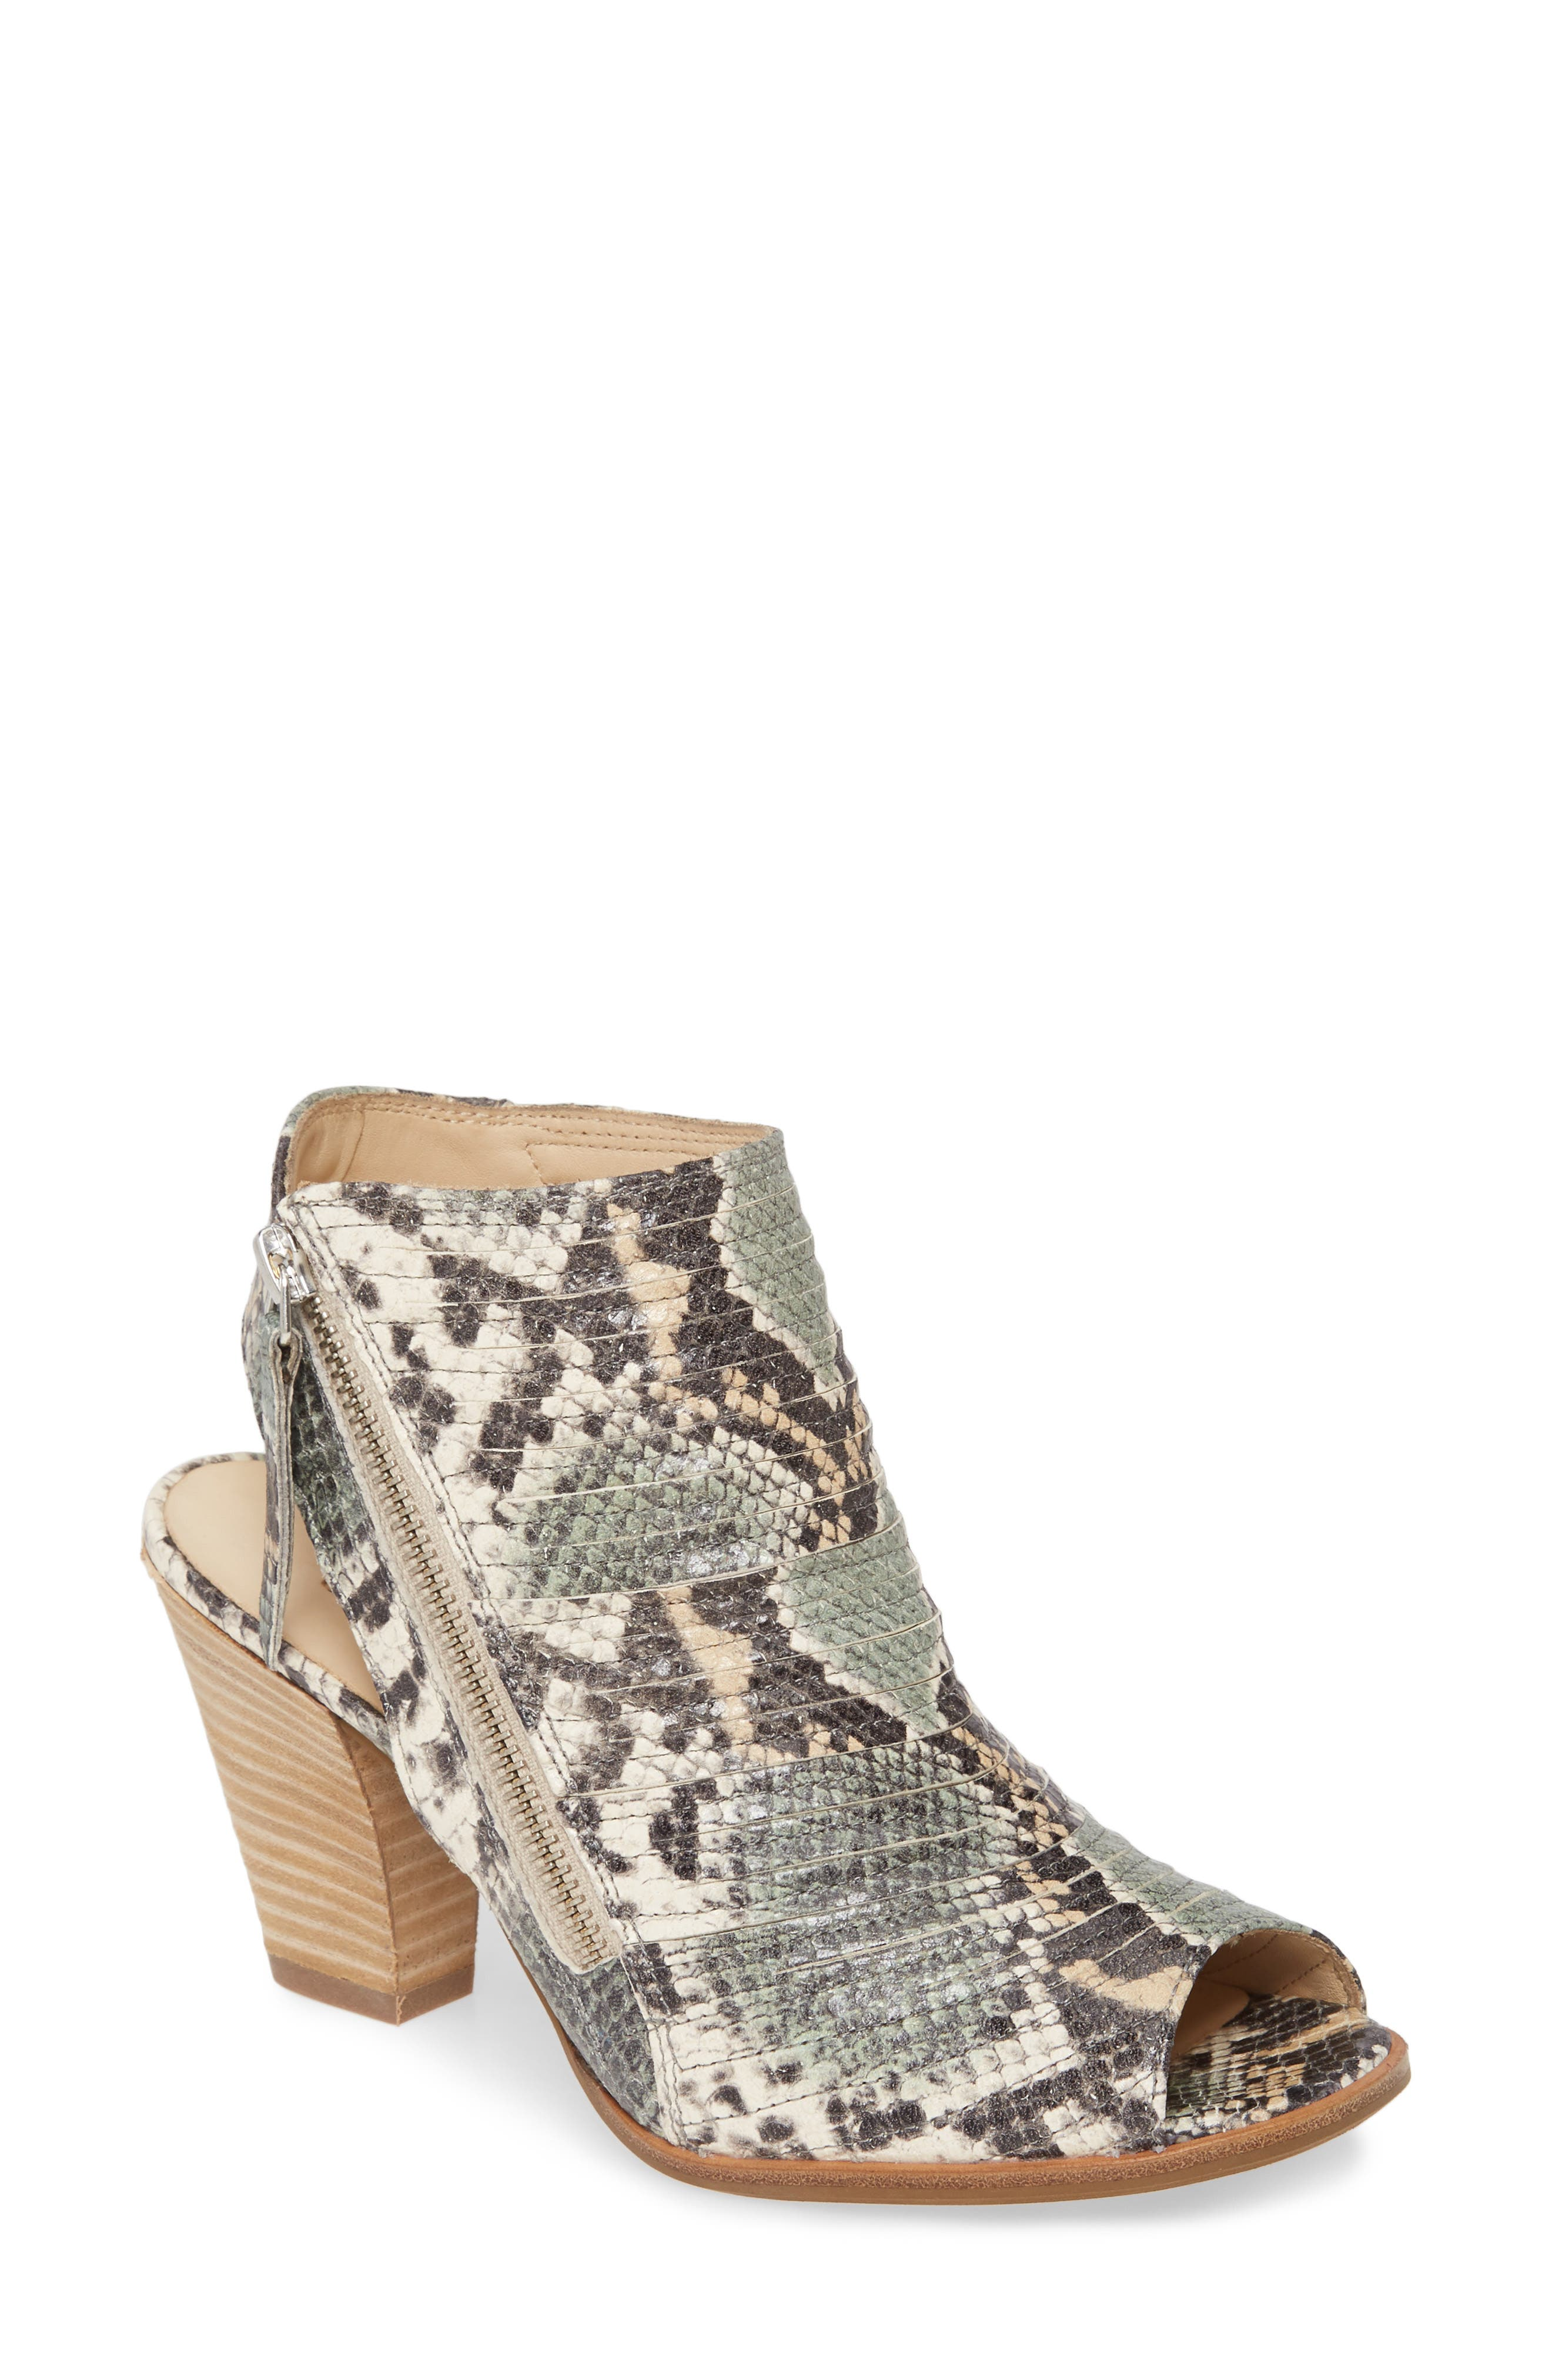 Paul Green | Cayanne Leather Peep Toe